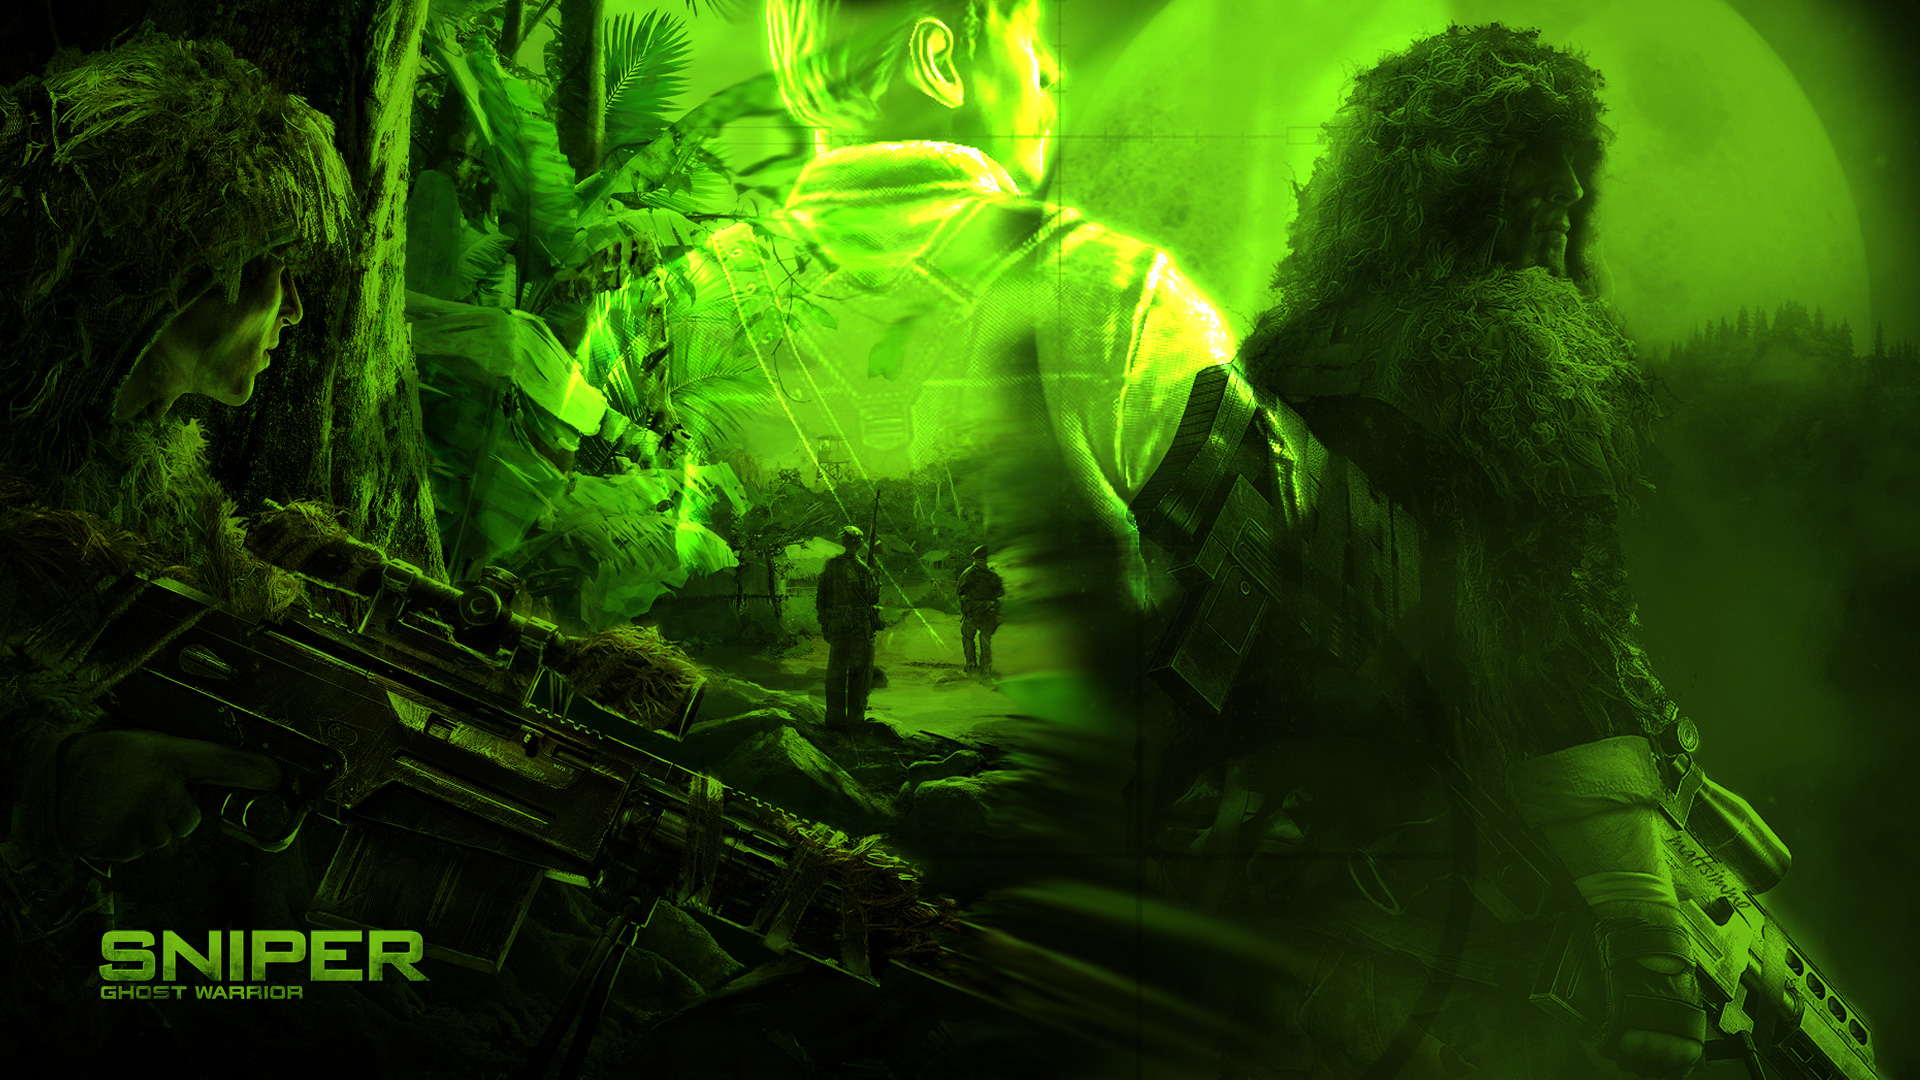 Sniper: Ghost Warrior HD Wallpaper